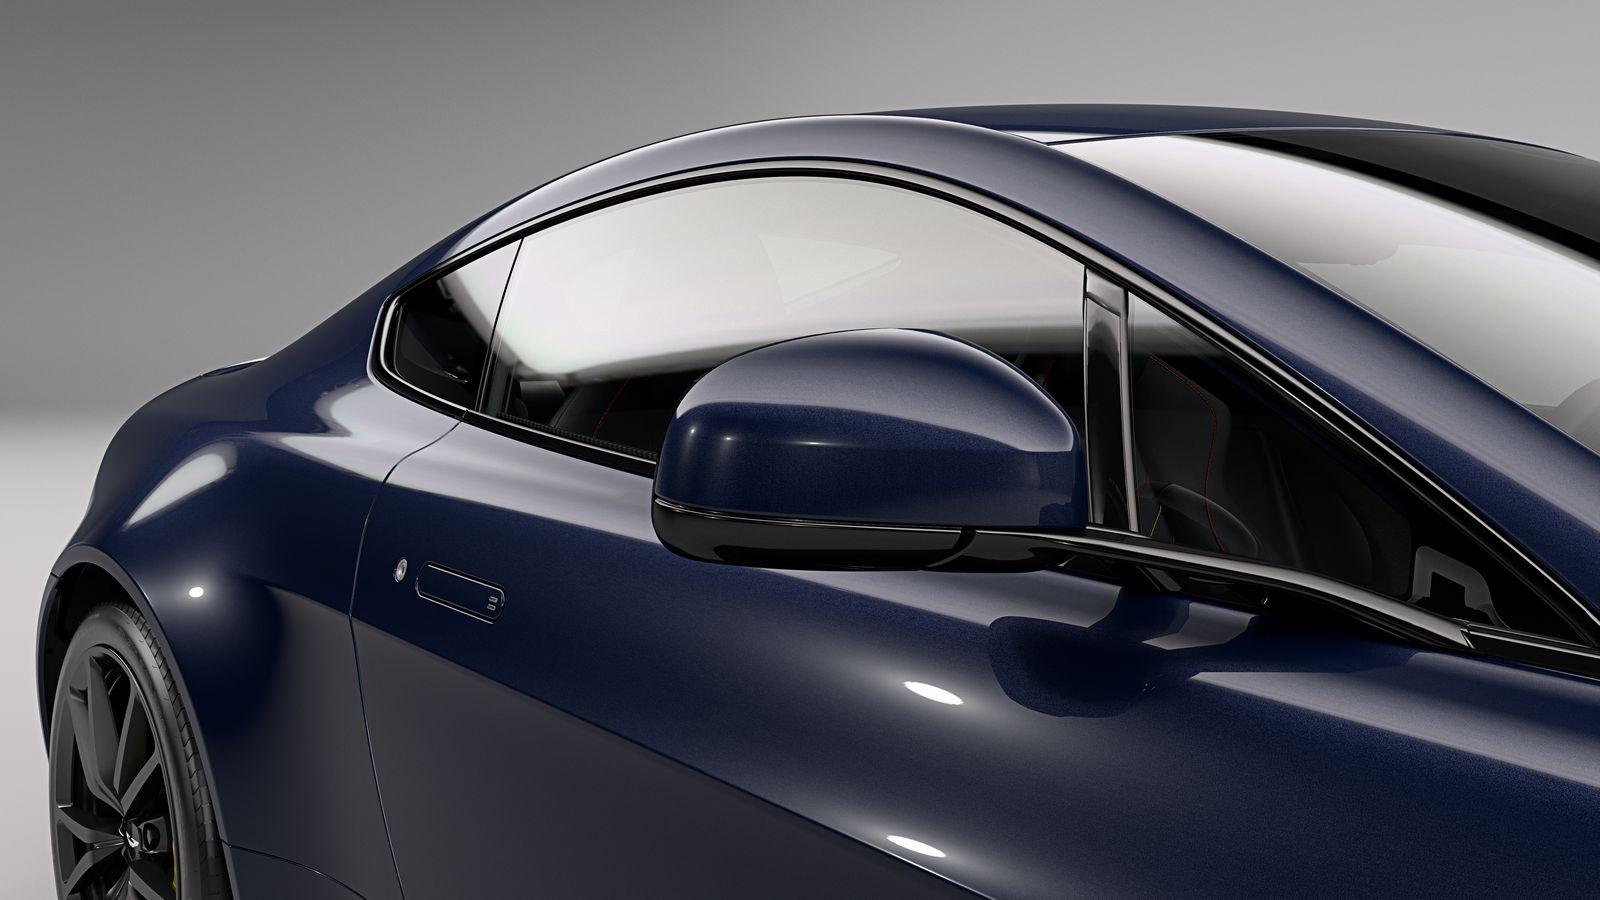 Aston Martin V8 and V12 Vantage Red Bull Racing Editions (15)